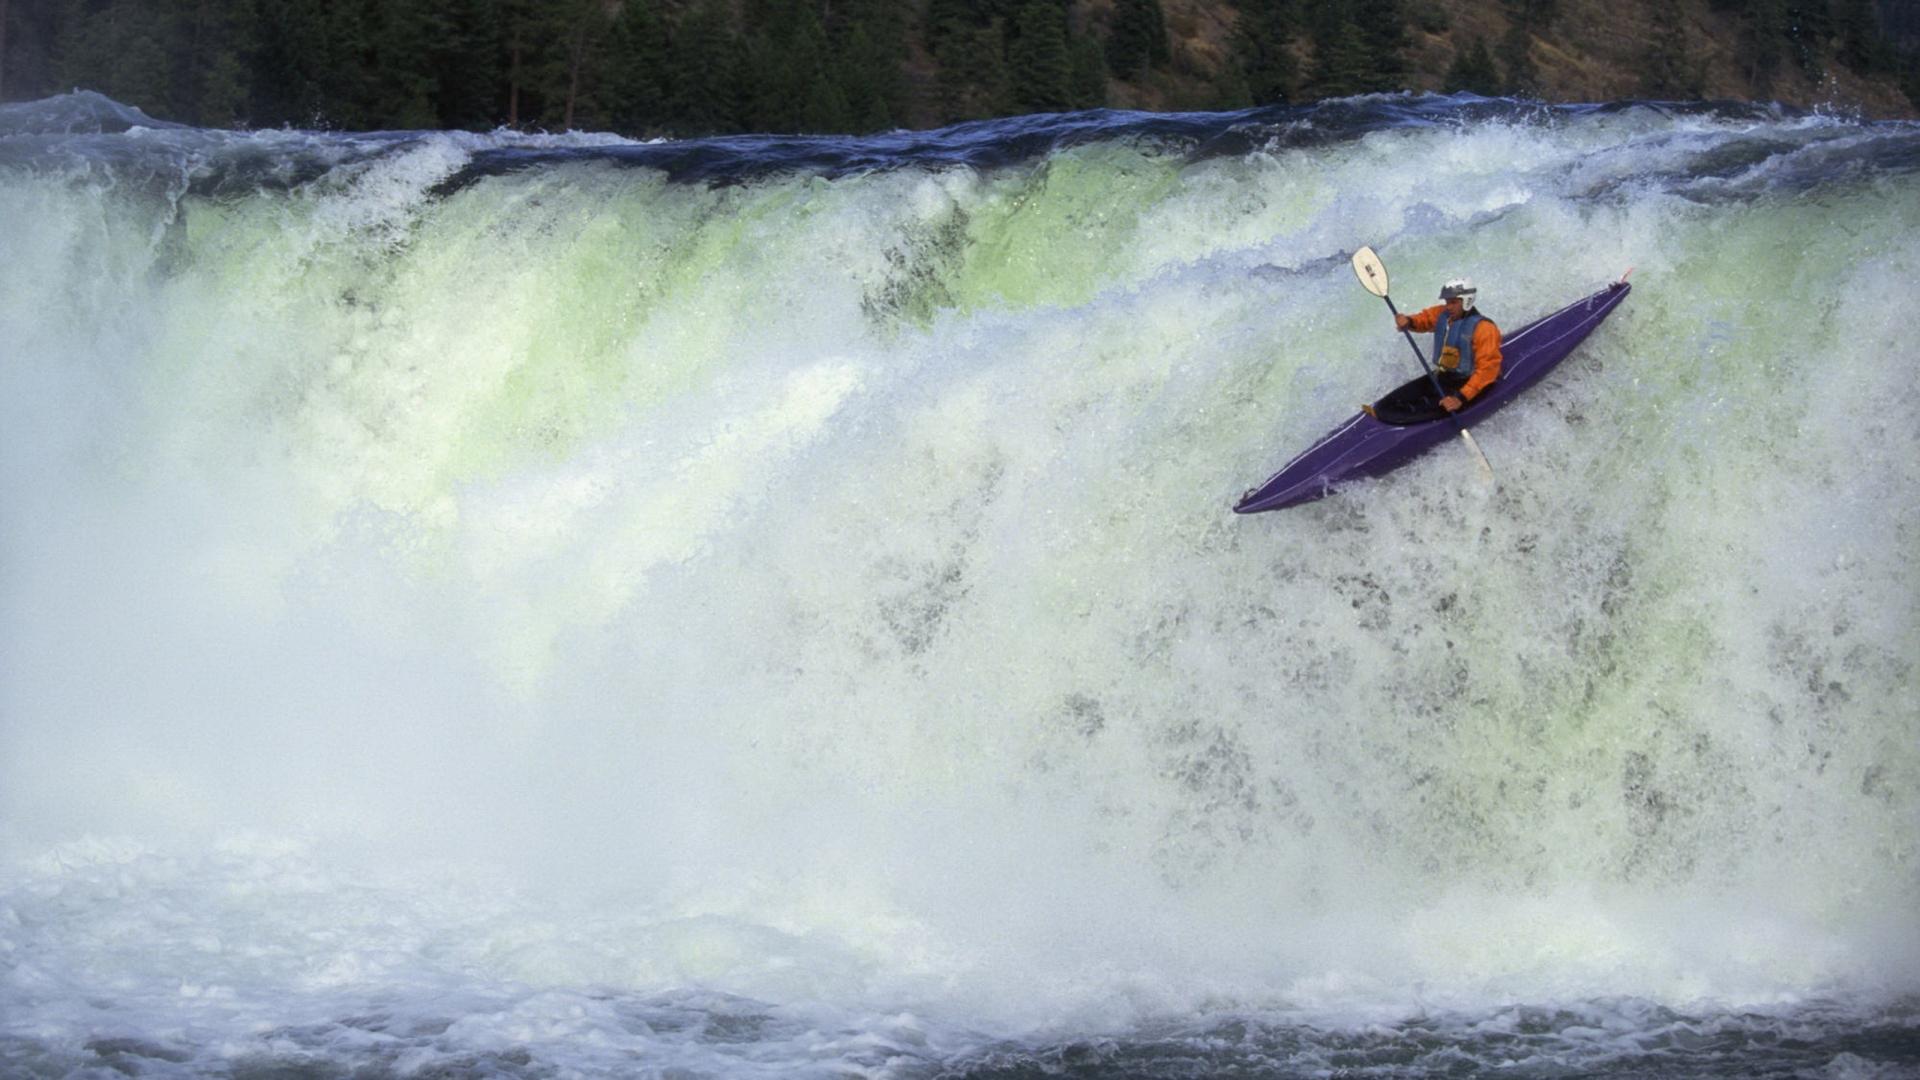 Kayak Full HD Wallpaper And Background Image